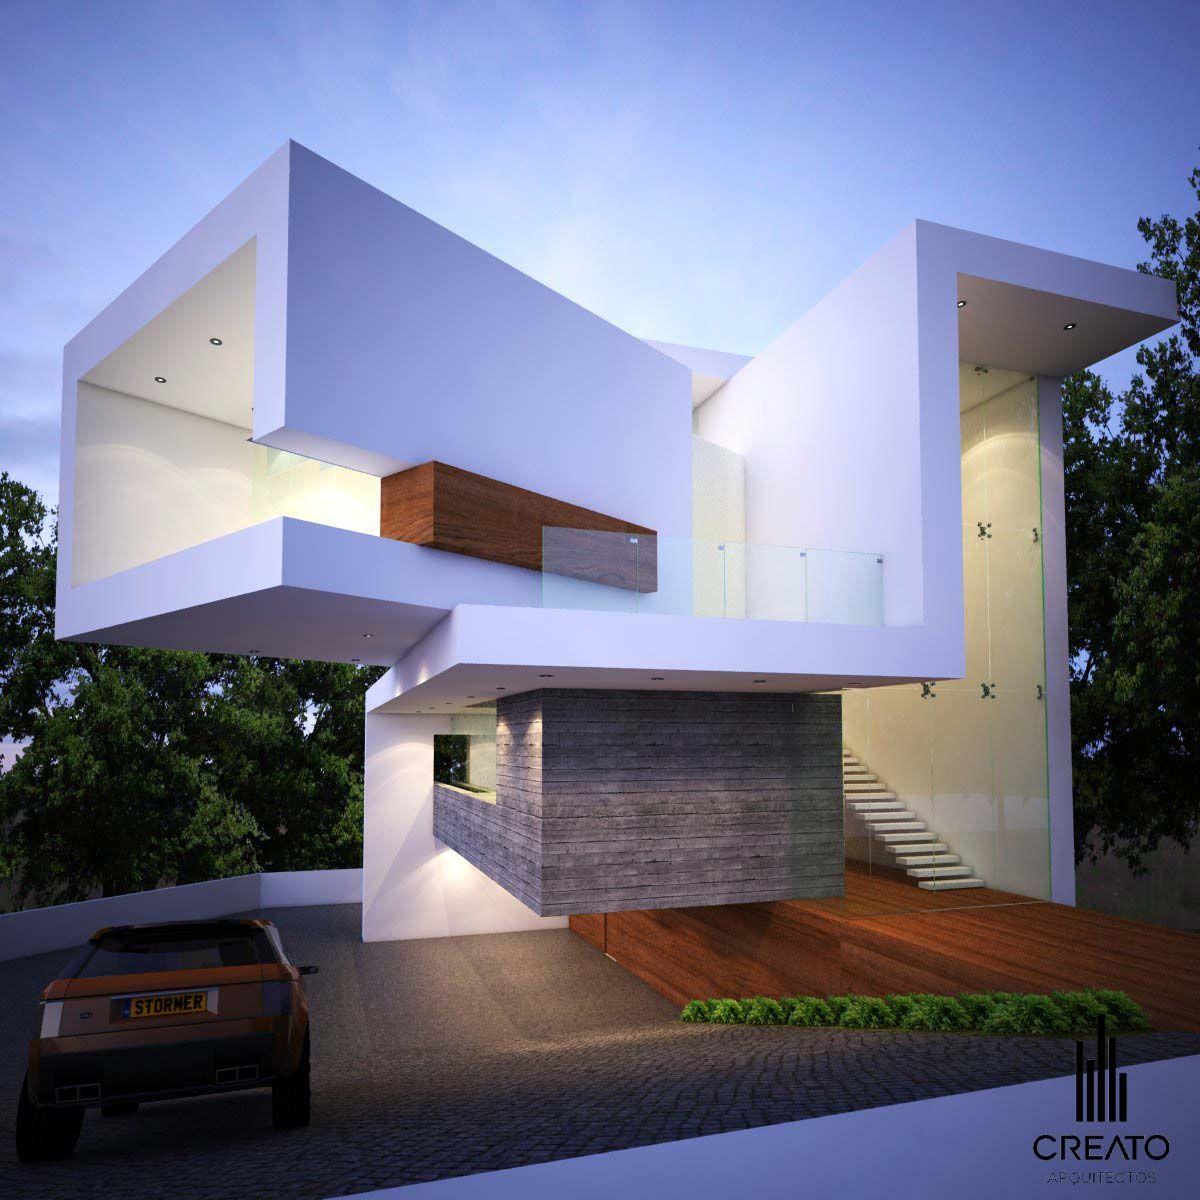 Casa bugambilias arquitetura pinterest arquitectos - Arquitectos casas modernas ...